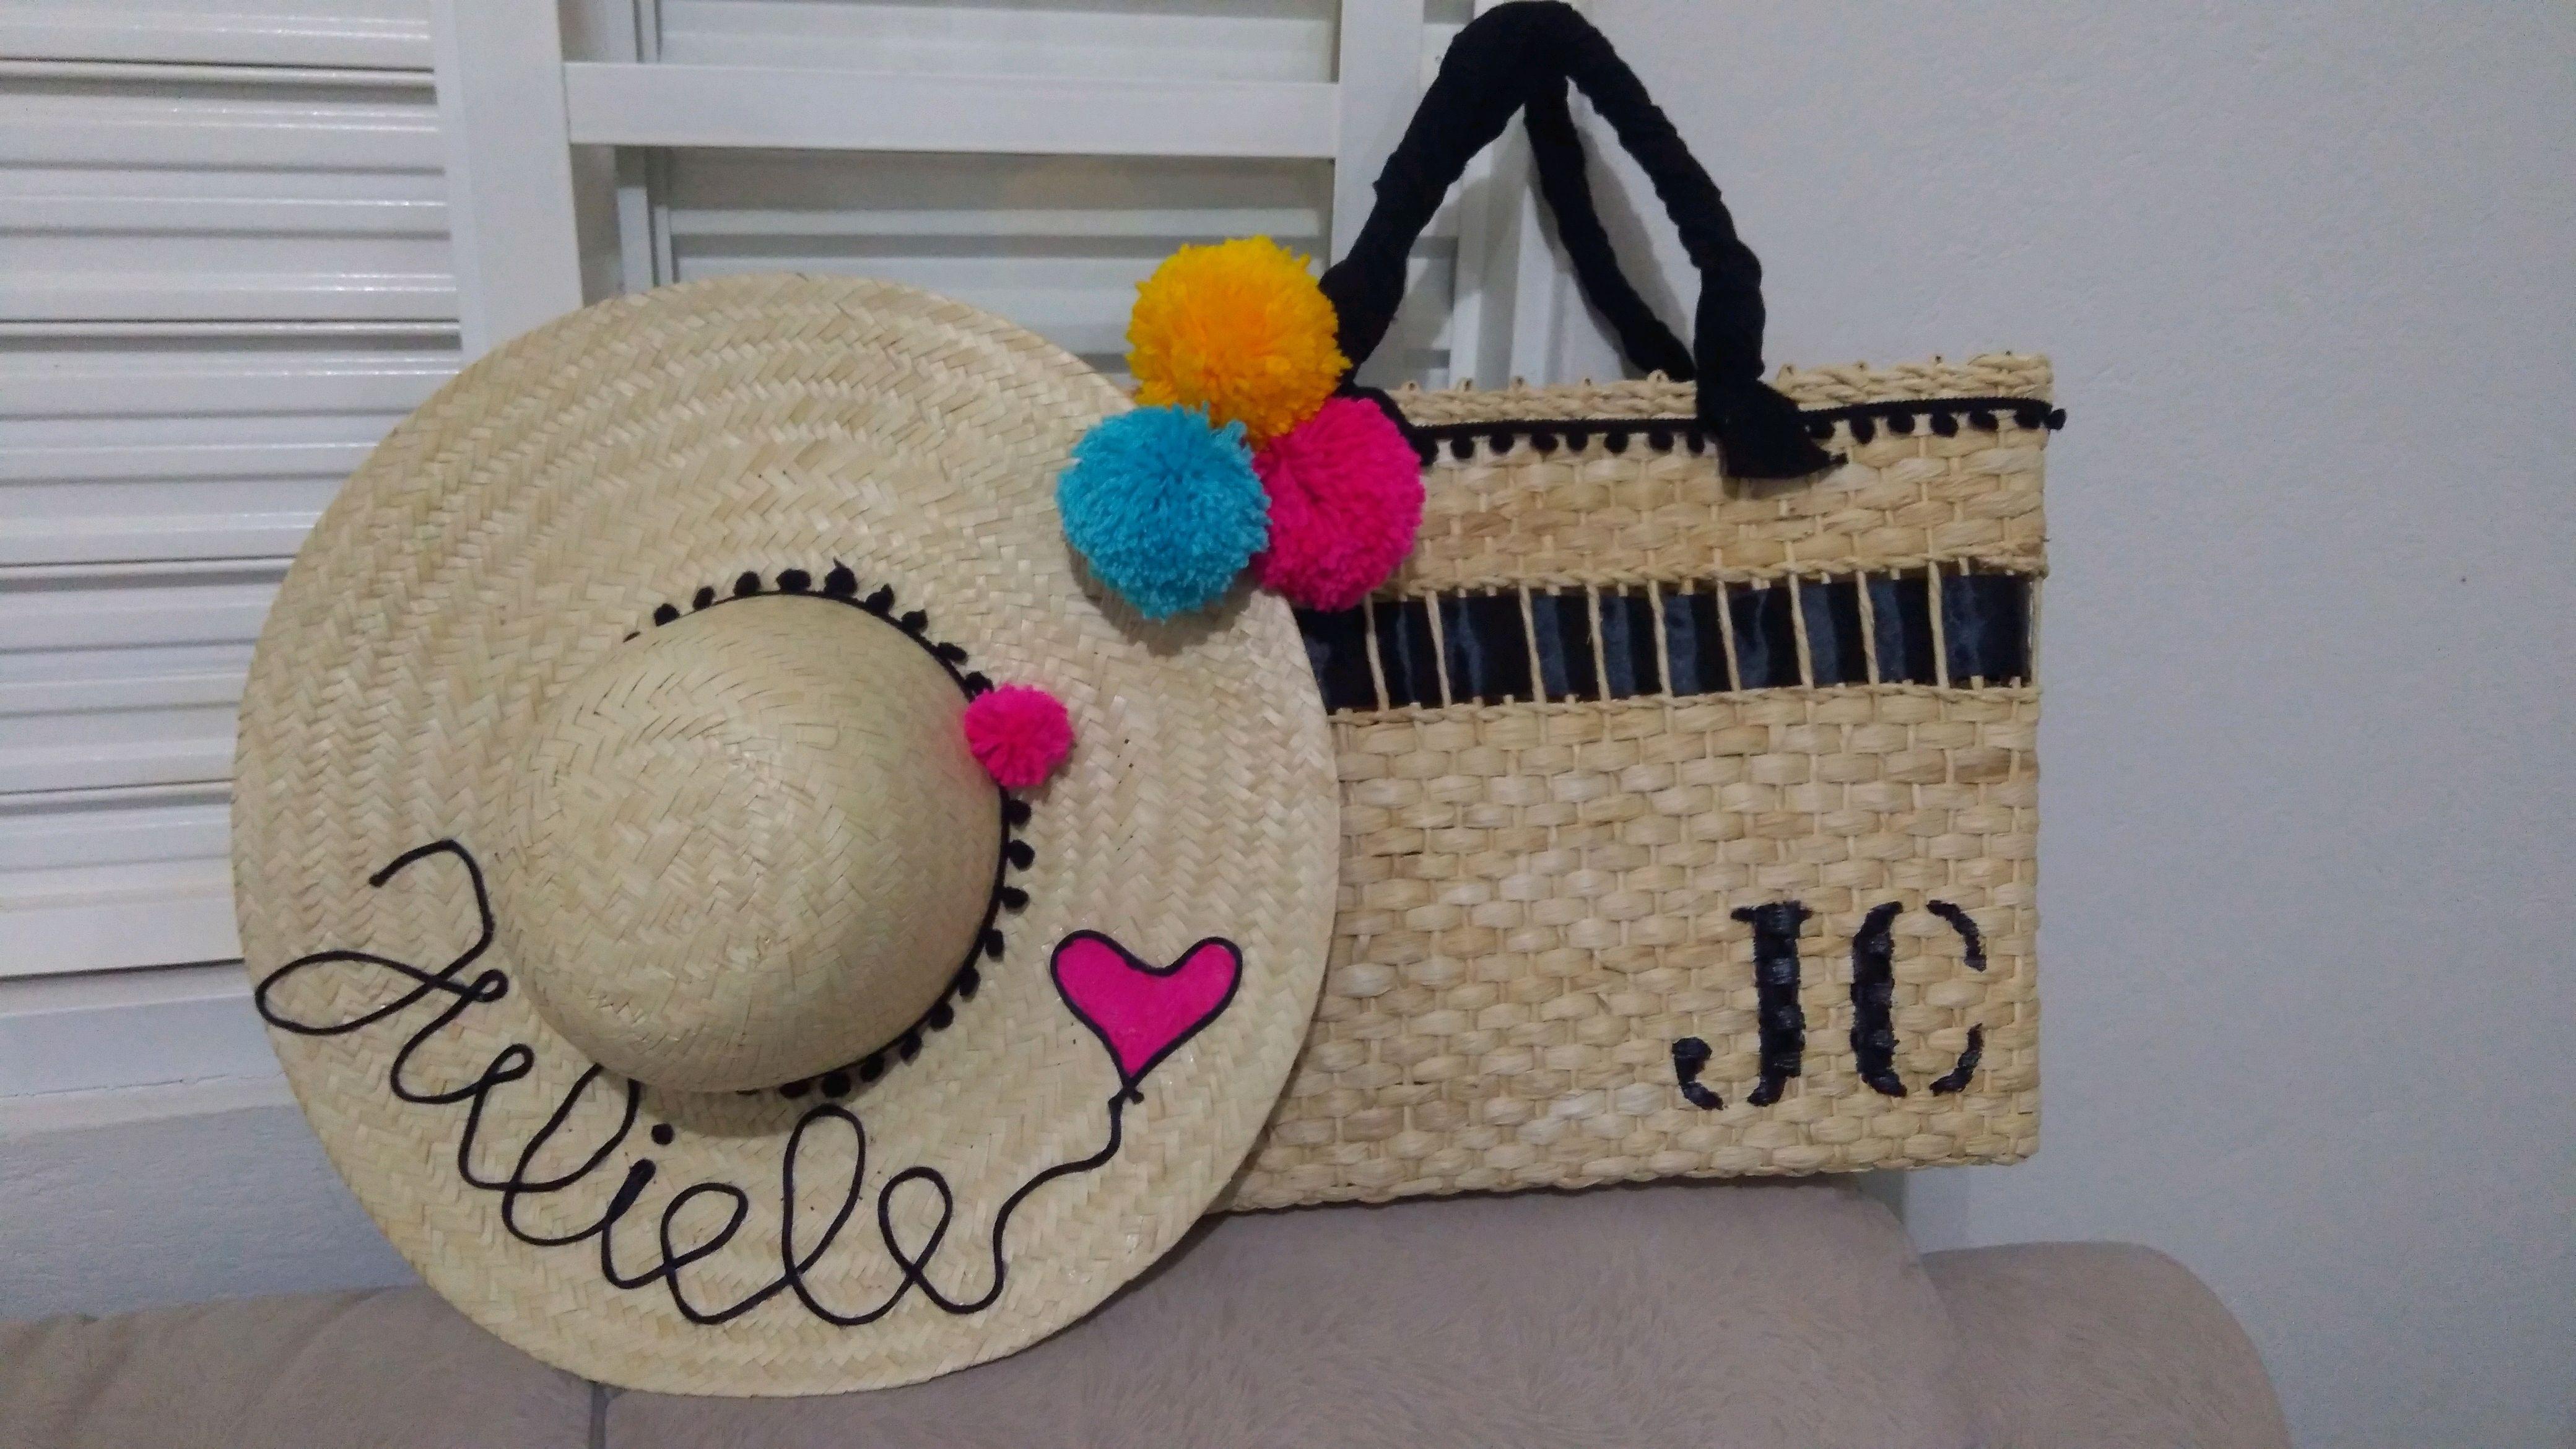 45efd87cfc781 Kit Chapéu de Palha Feminino e Masculino